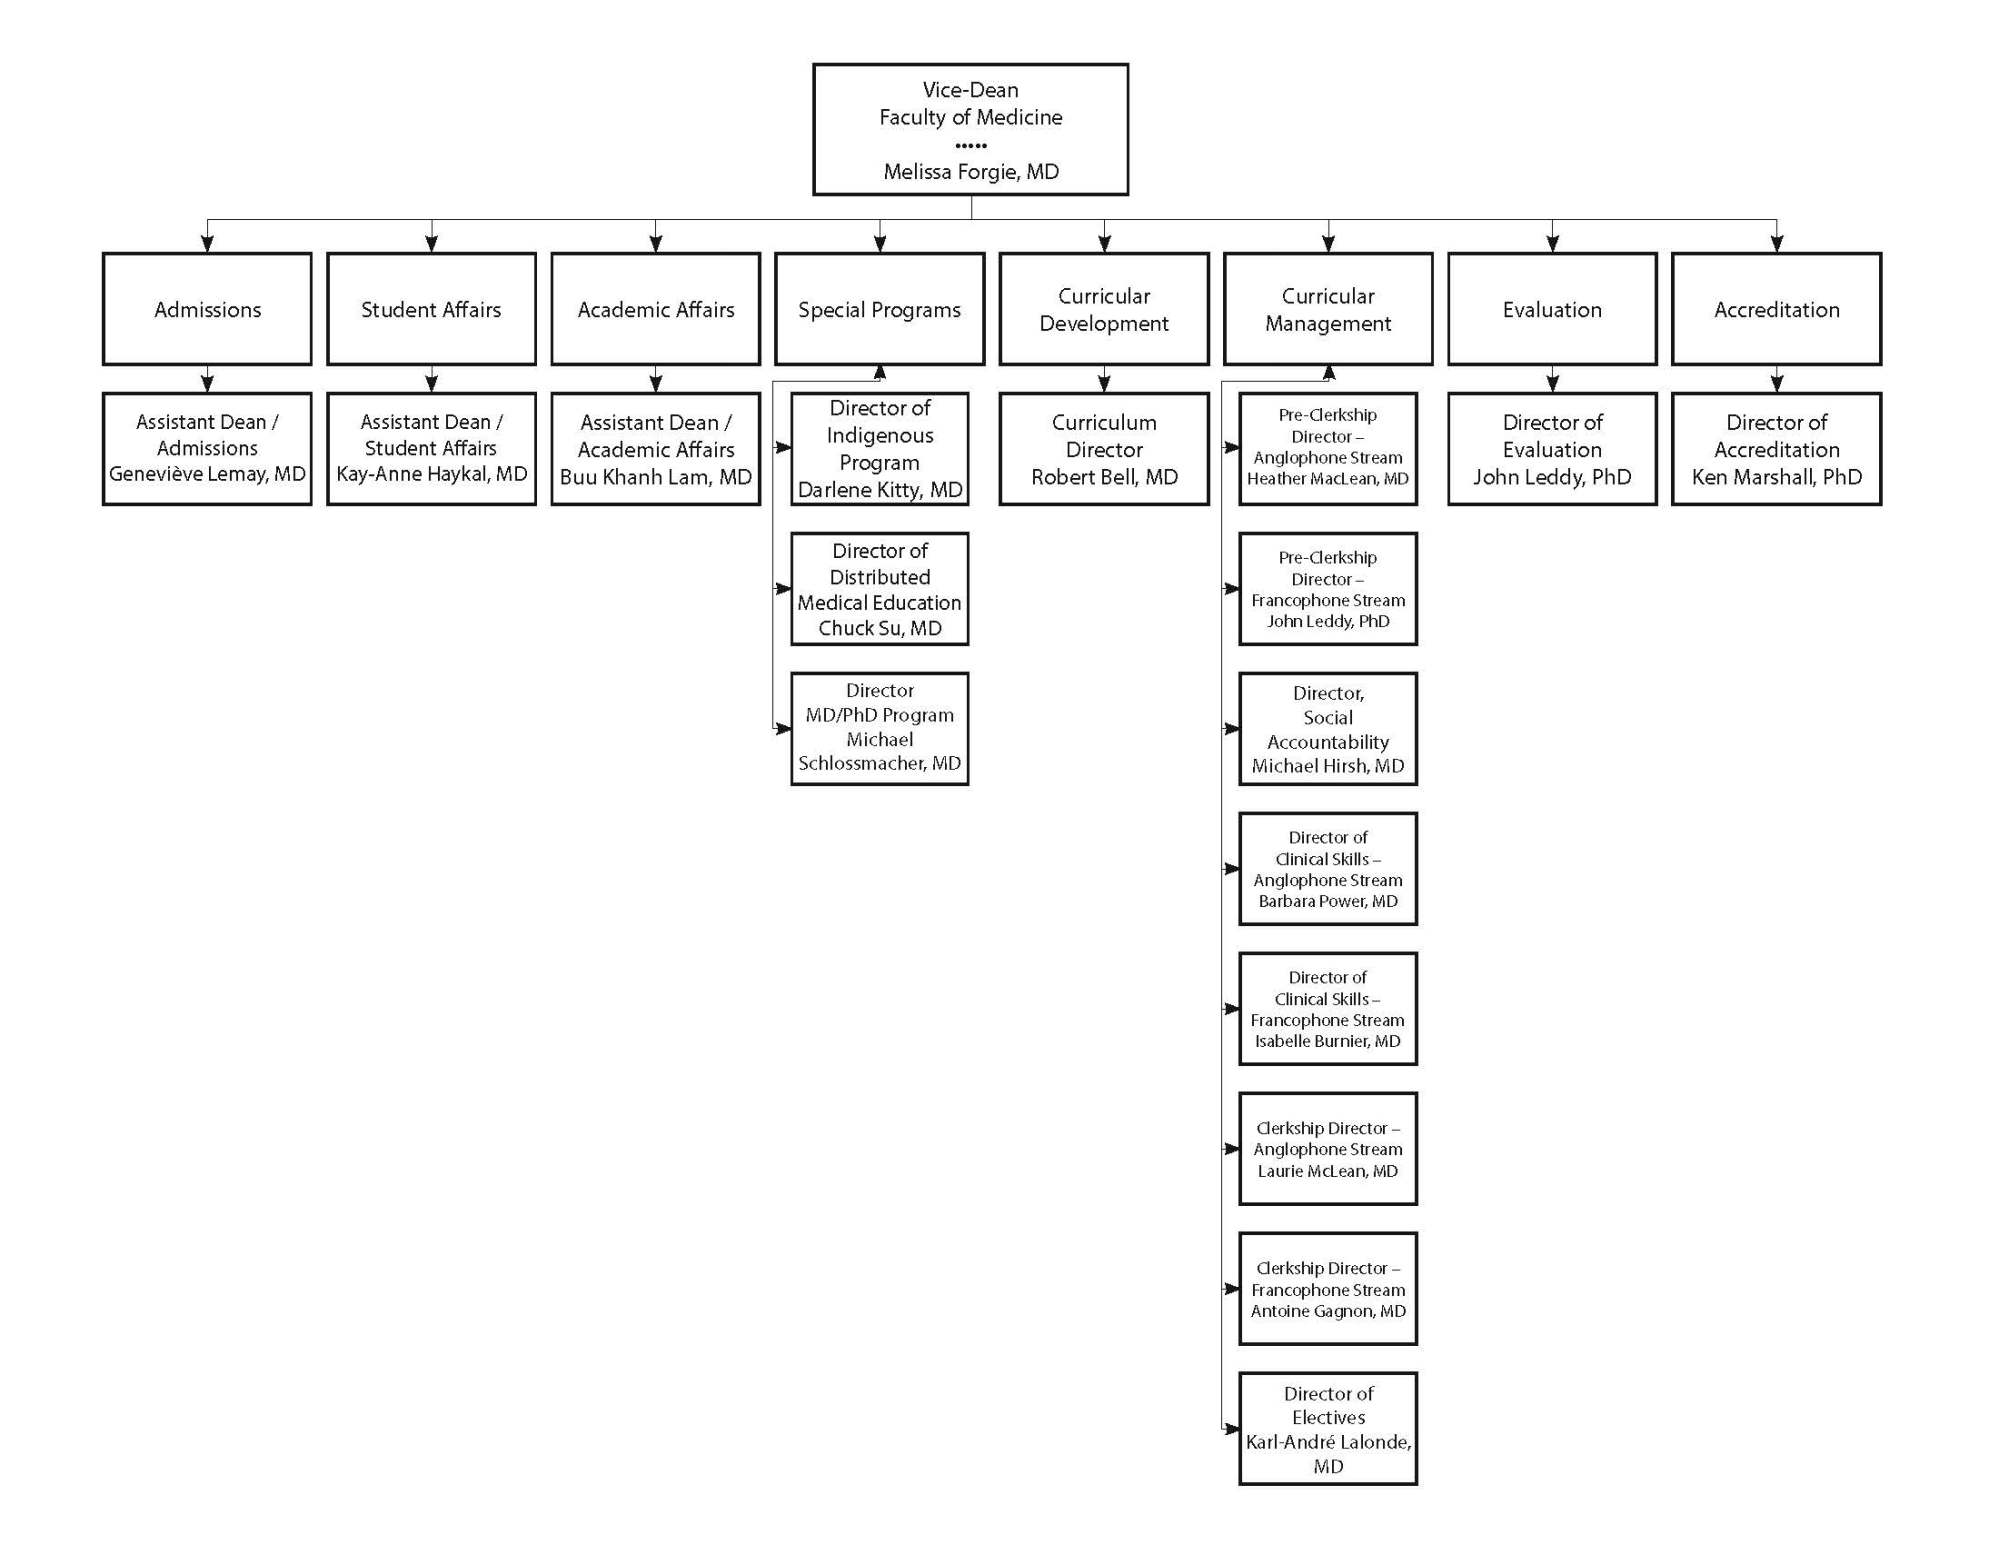 hight resolution of ugme program leadership org chart